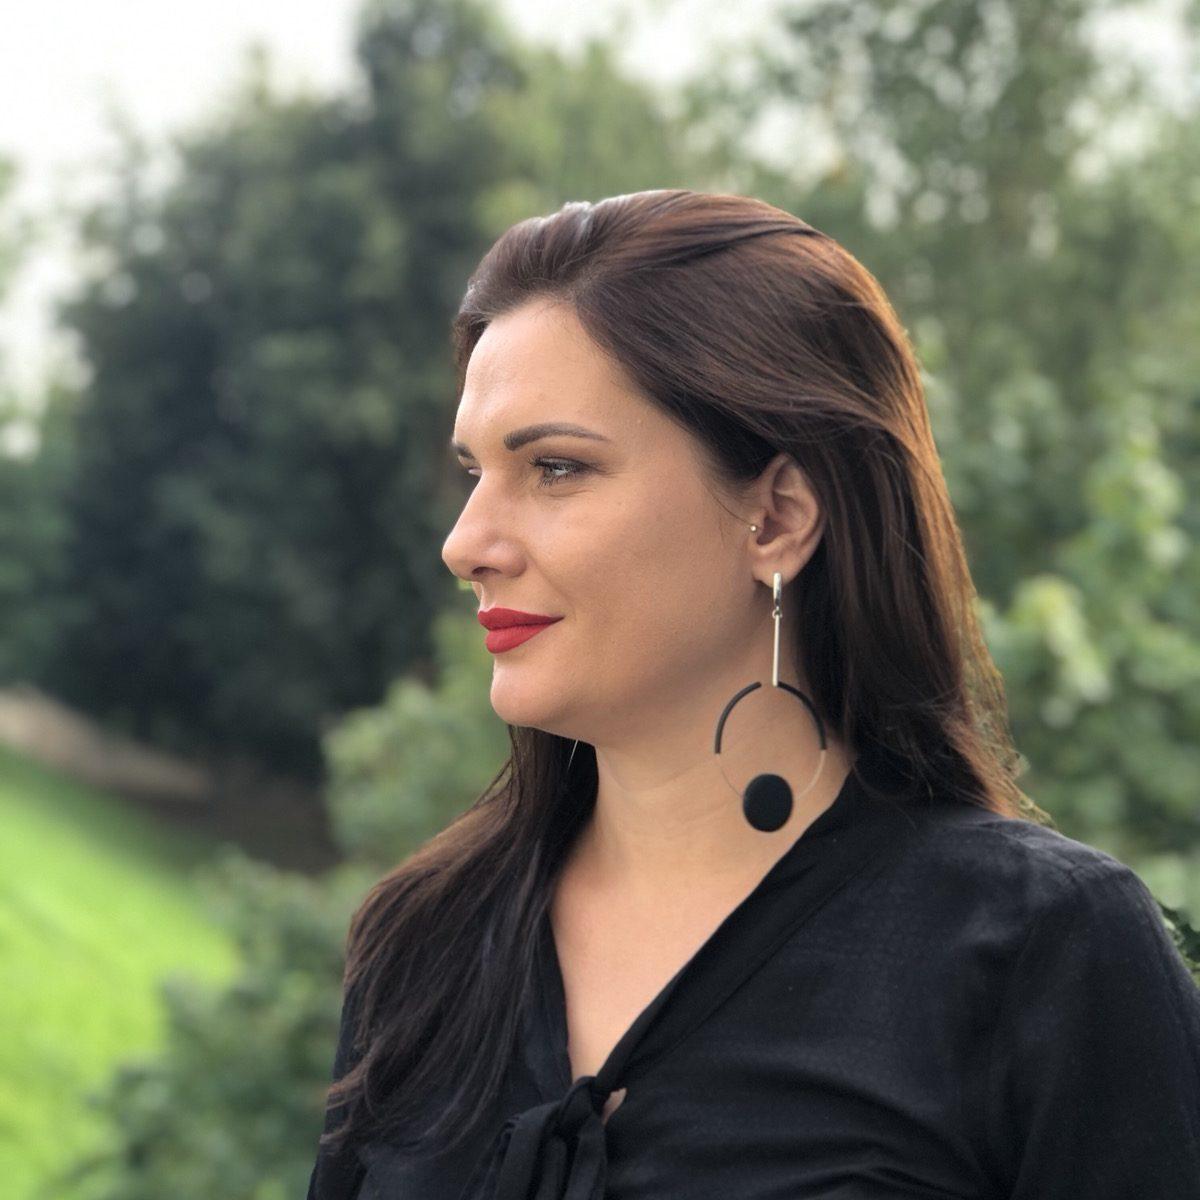 Алагулова Екатерина Сергеевна